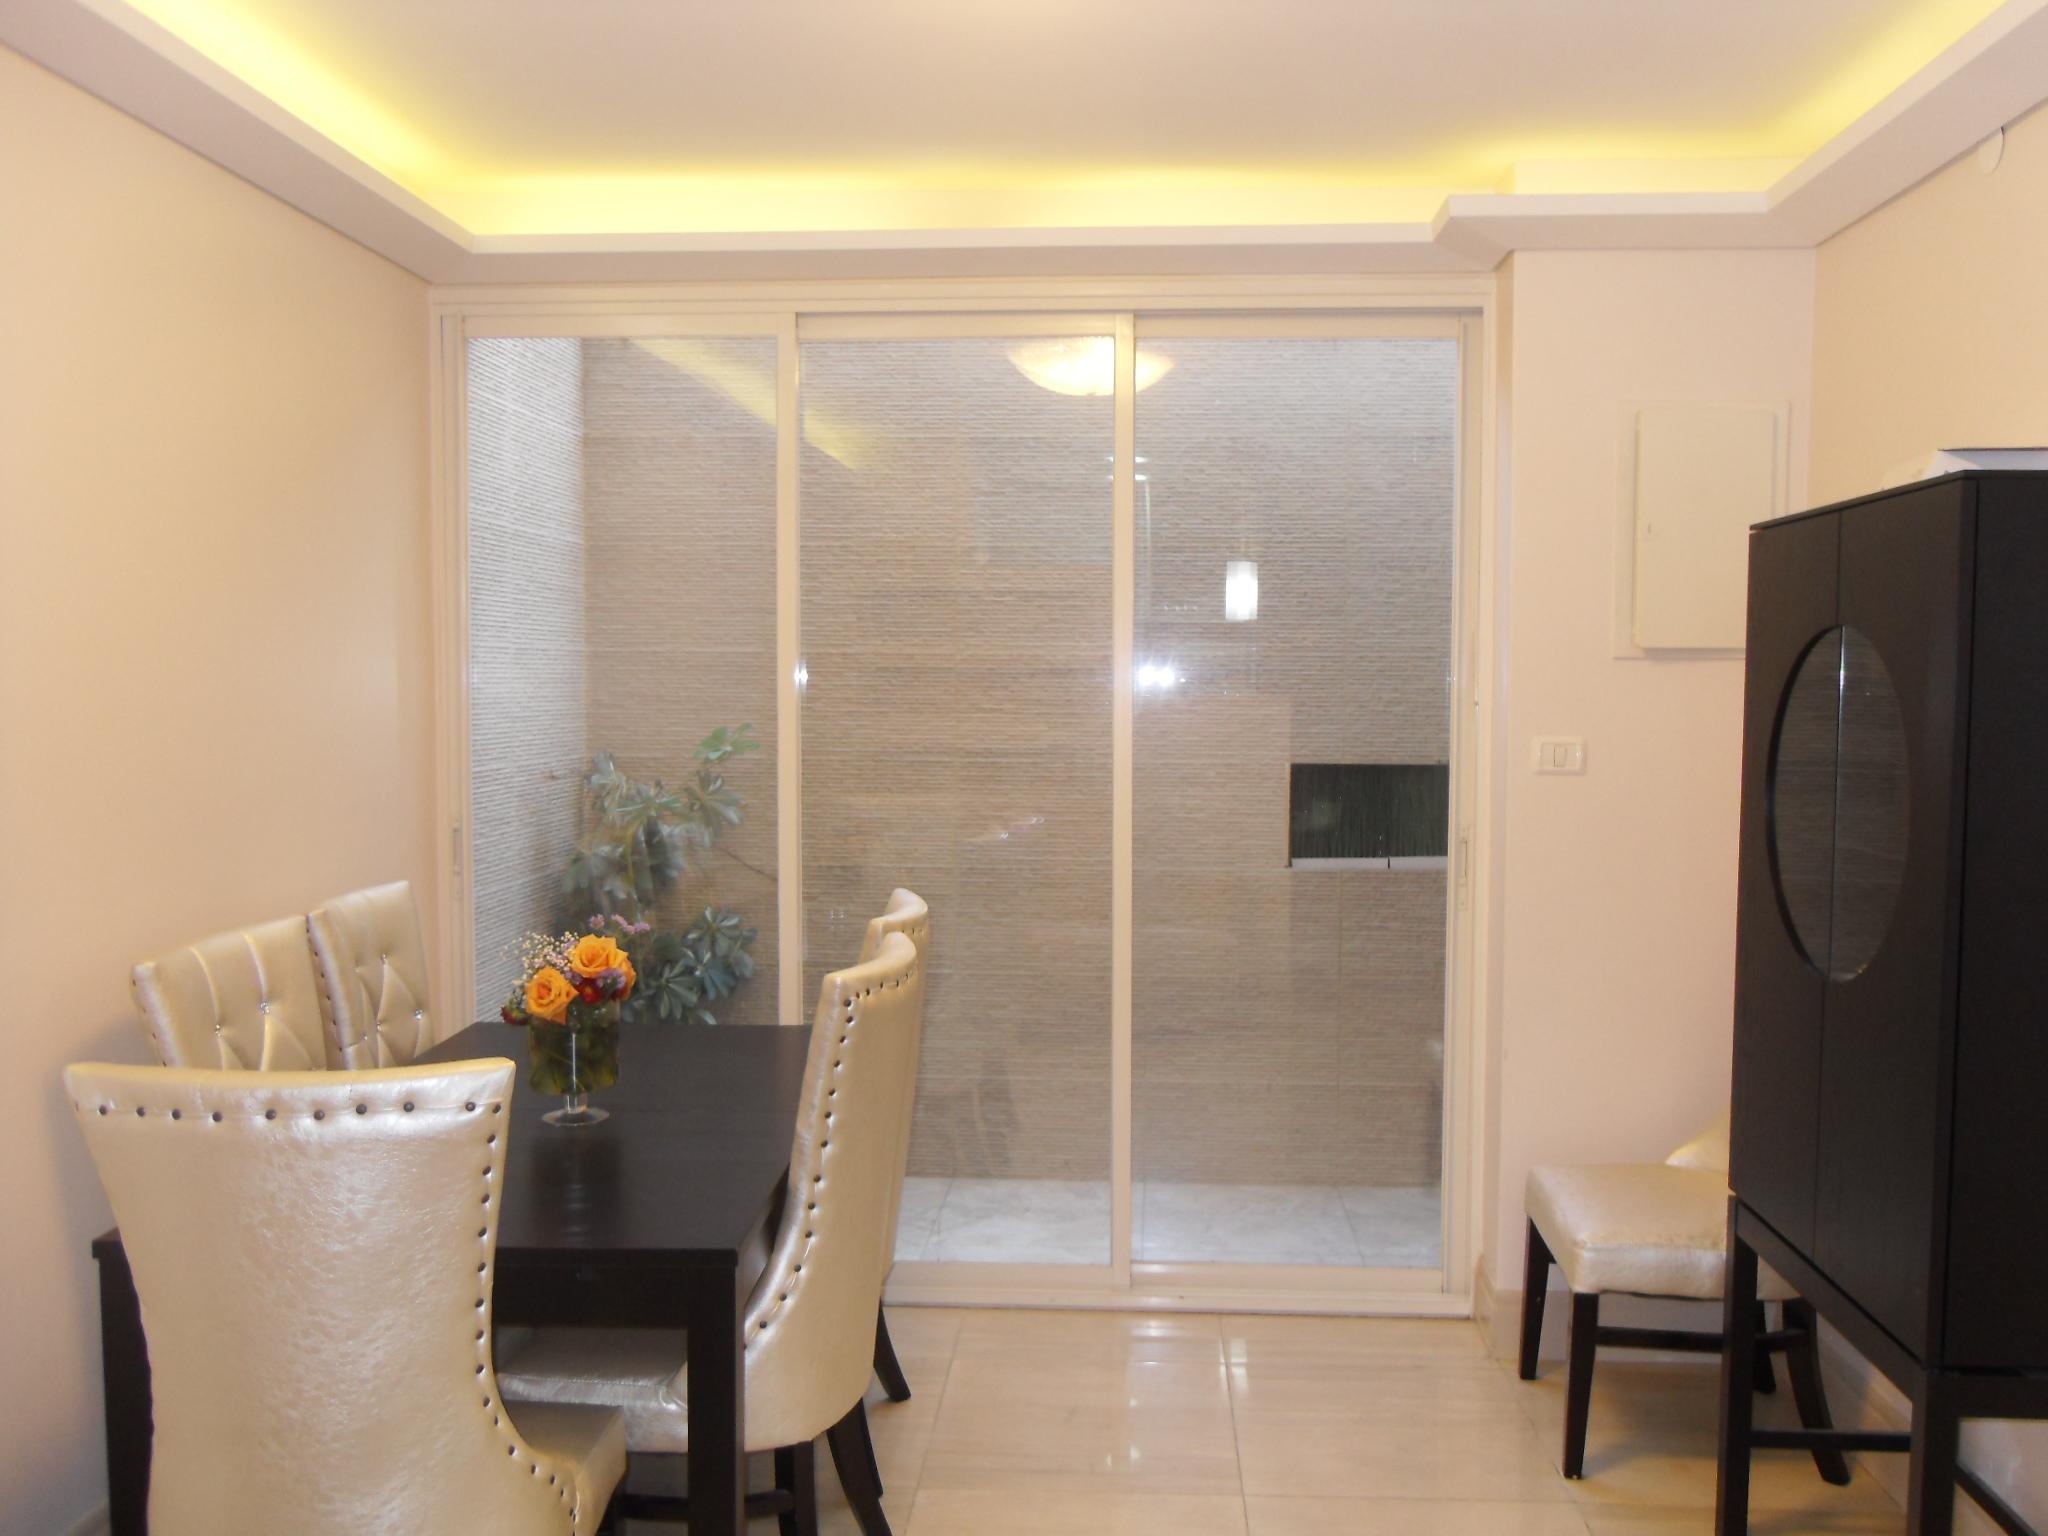 2 Bedroom in Minchat Yitzchak